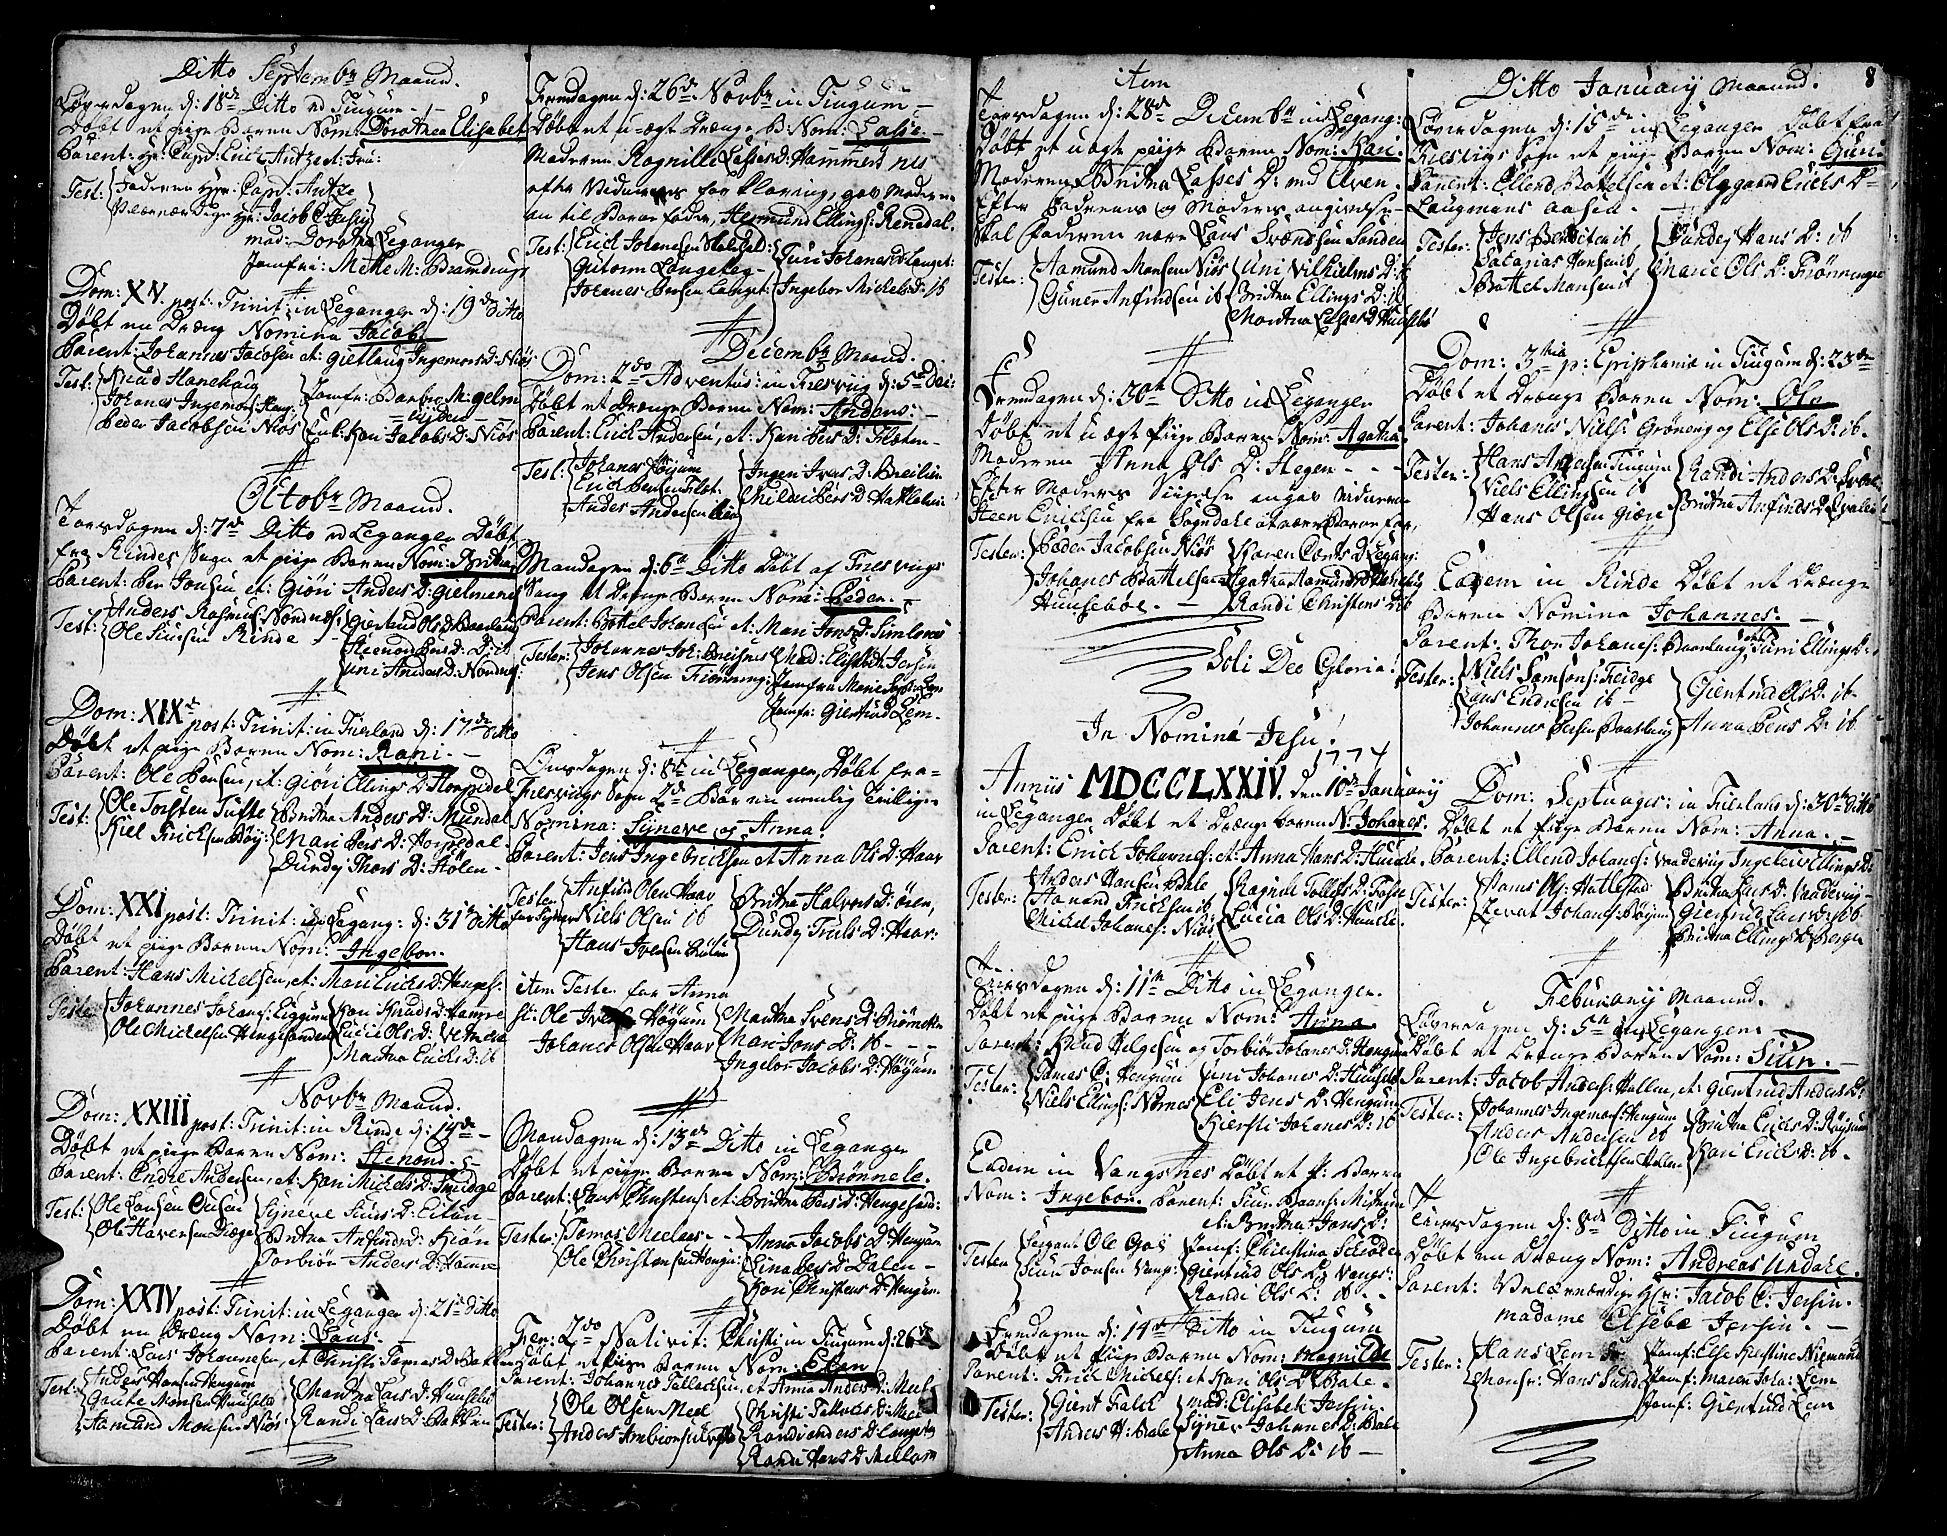 SAB, Leikanger sokneprestembete, Ministerialbok nr. A 4, 1770-1791, s. 8